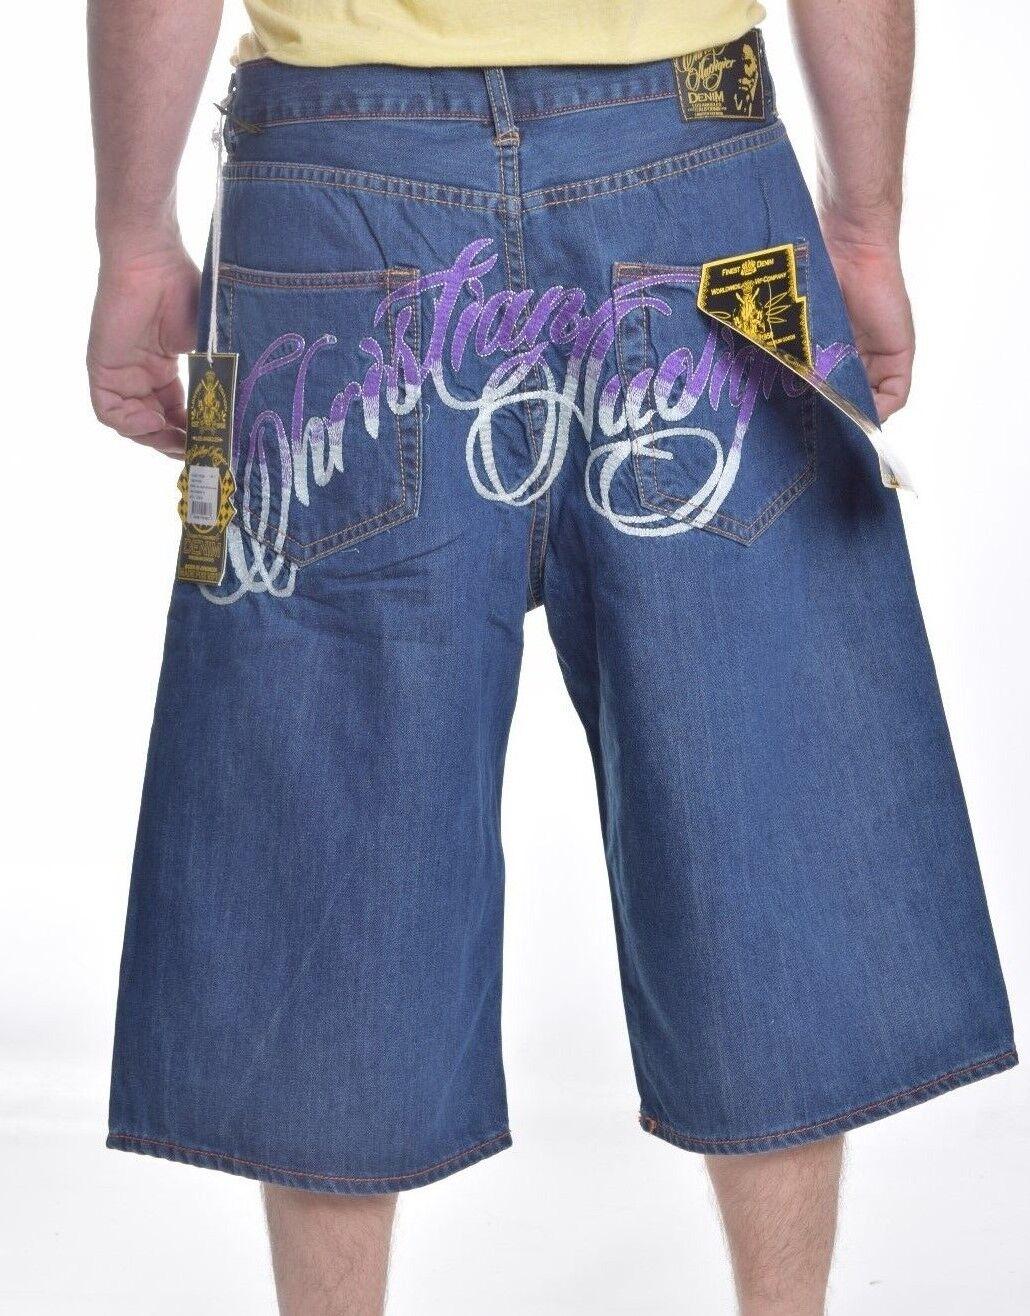 Christian Audigier Men's  bluee Button Fly Denim Shorts Choose Size